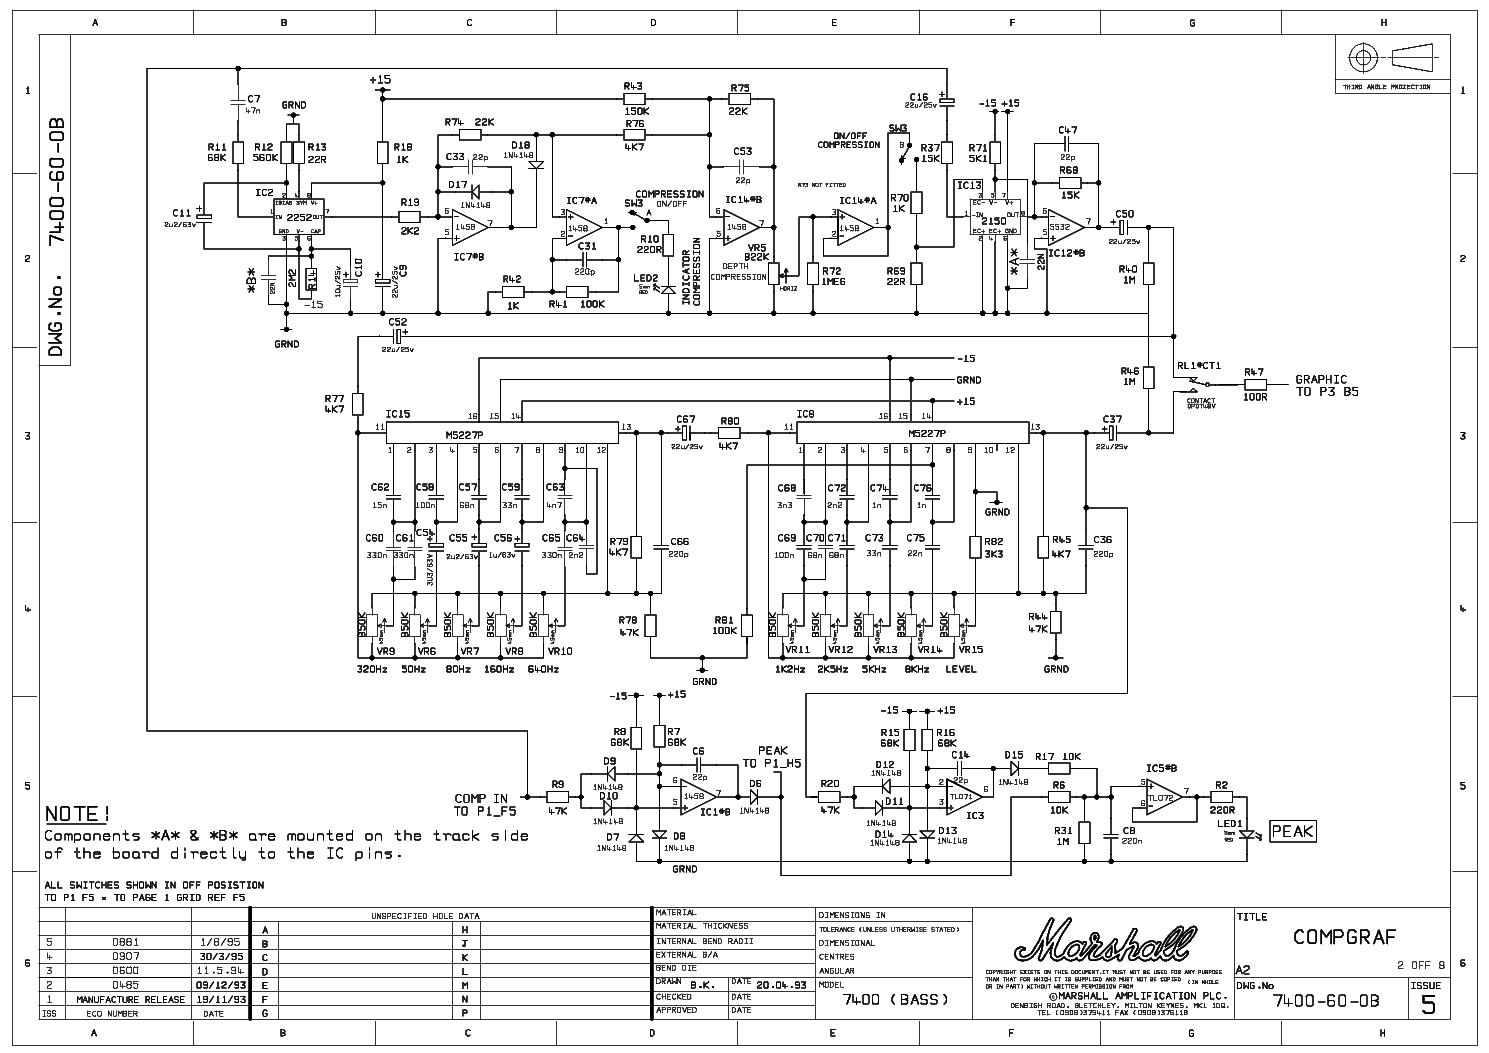 marshall dbs 400w 7400 service manual (2nd page)